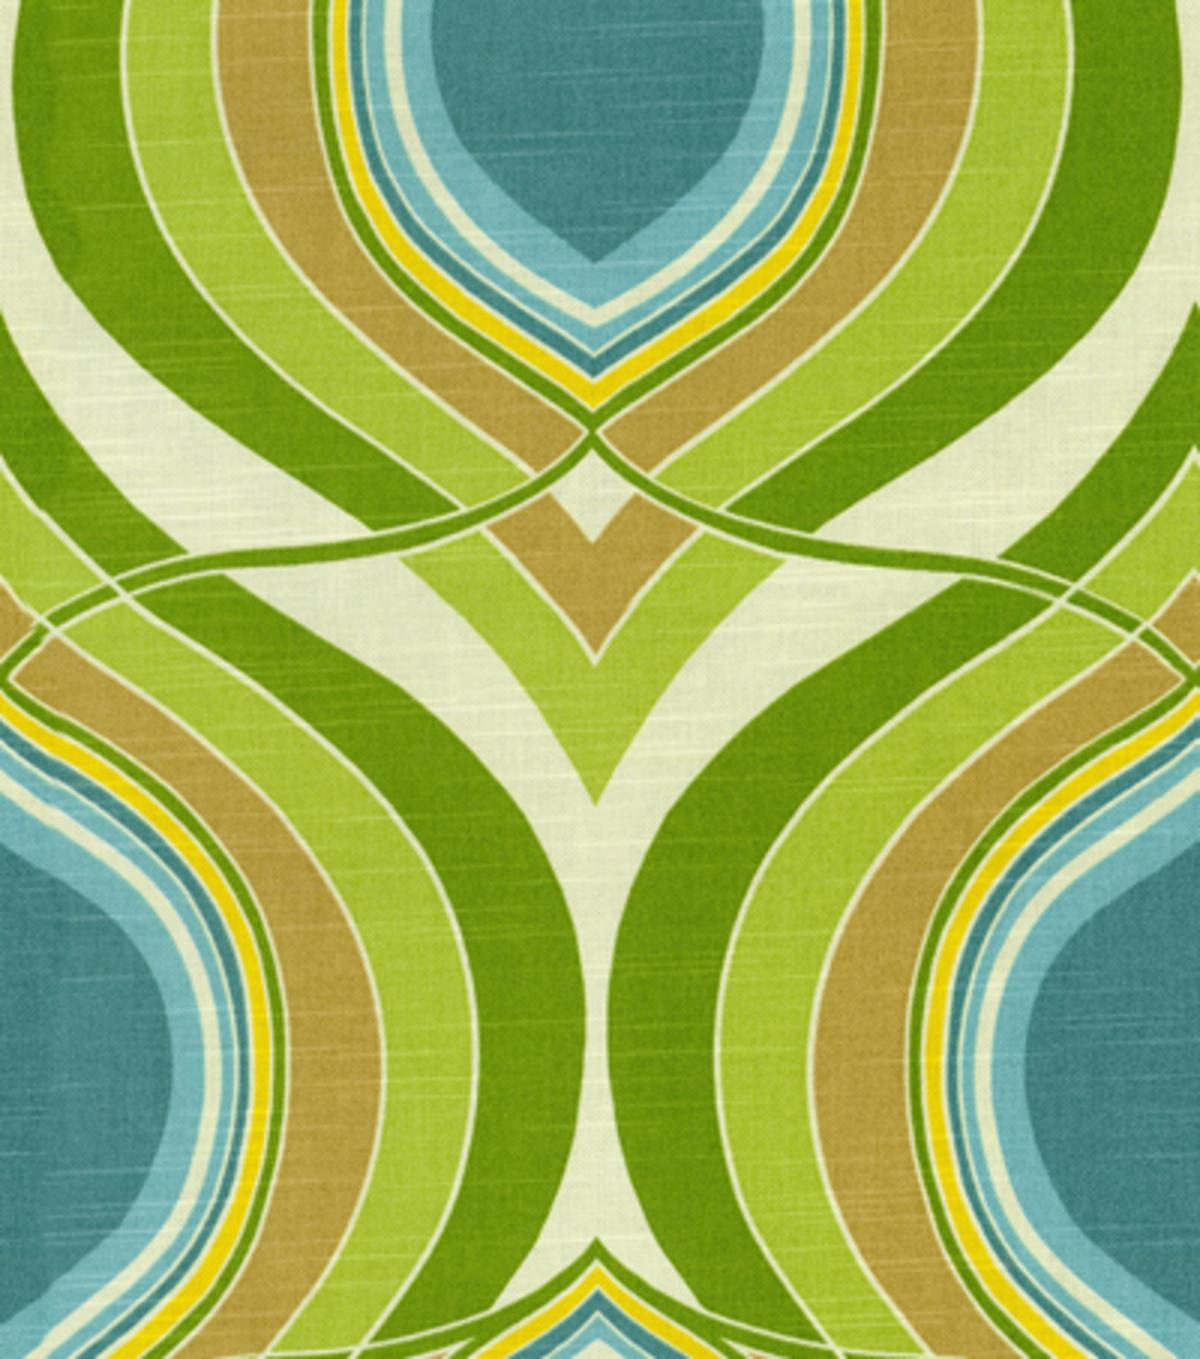 Home Decor 8''x 8''Swatch Print Fabric- HGTV HOME Groove